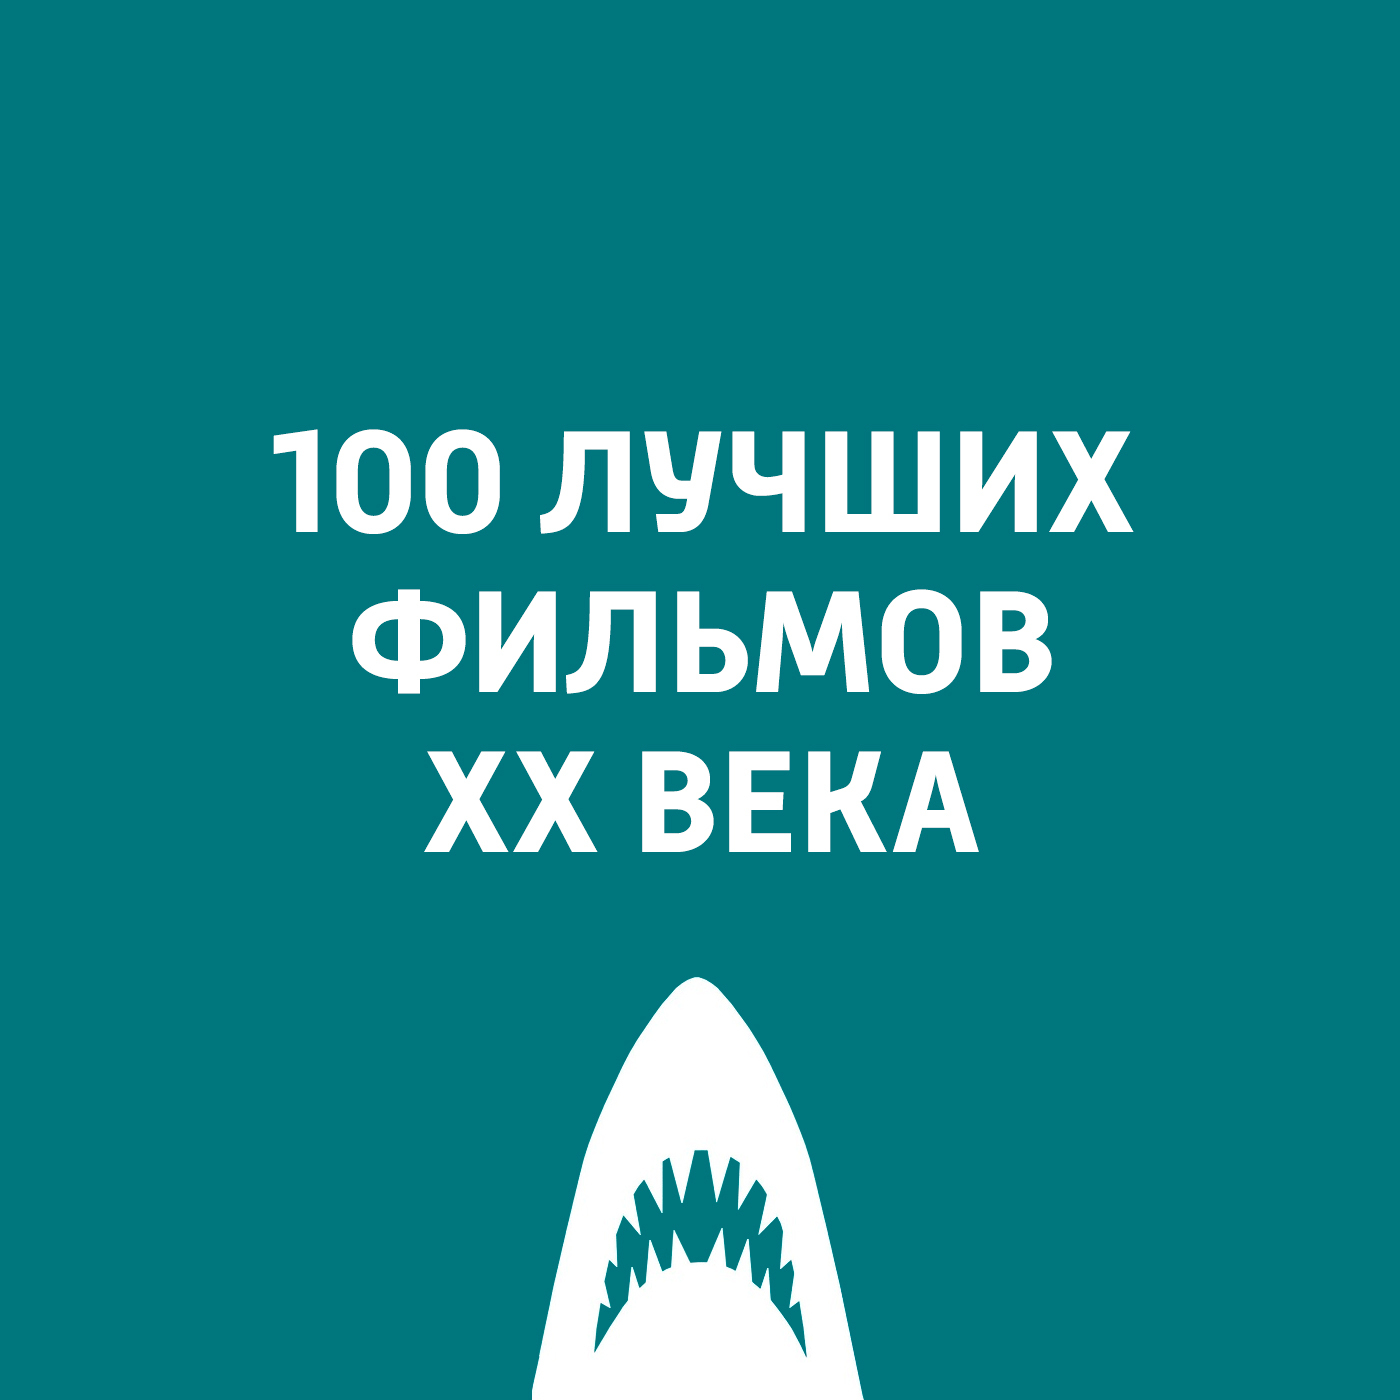 Антон Долин Орфей антон долин орфей